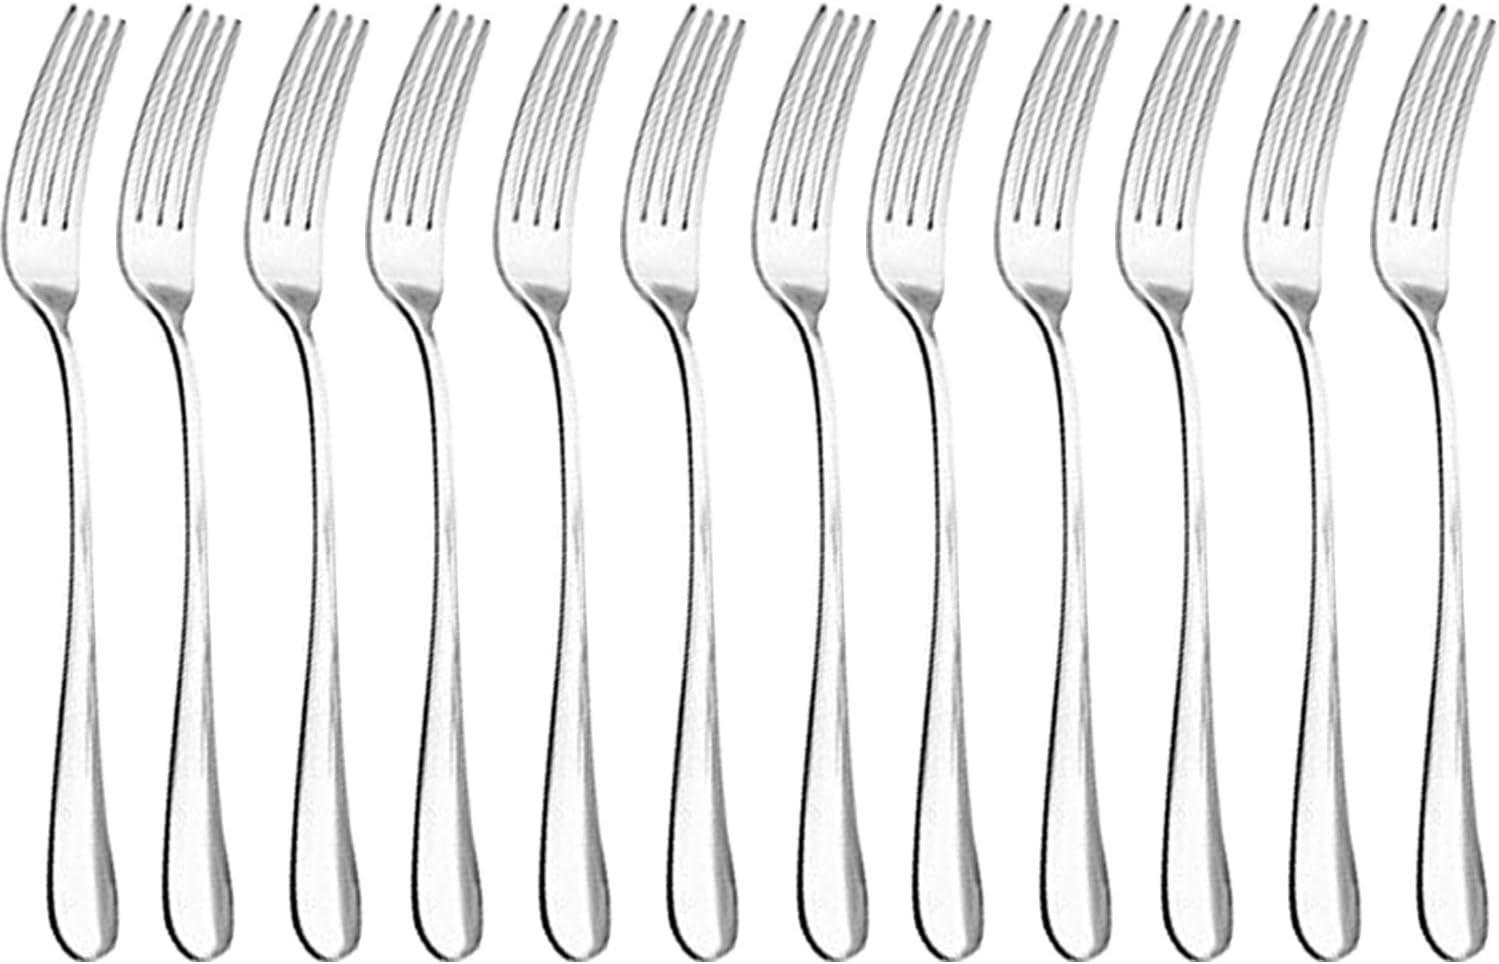 Qucher - Cubertería (tenedores de 18,2 cm, cuchillos de carne de 22,8 cm, cucharas largas de 19 cm, cucharas para sopa de 16,5 cm)